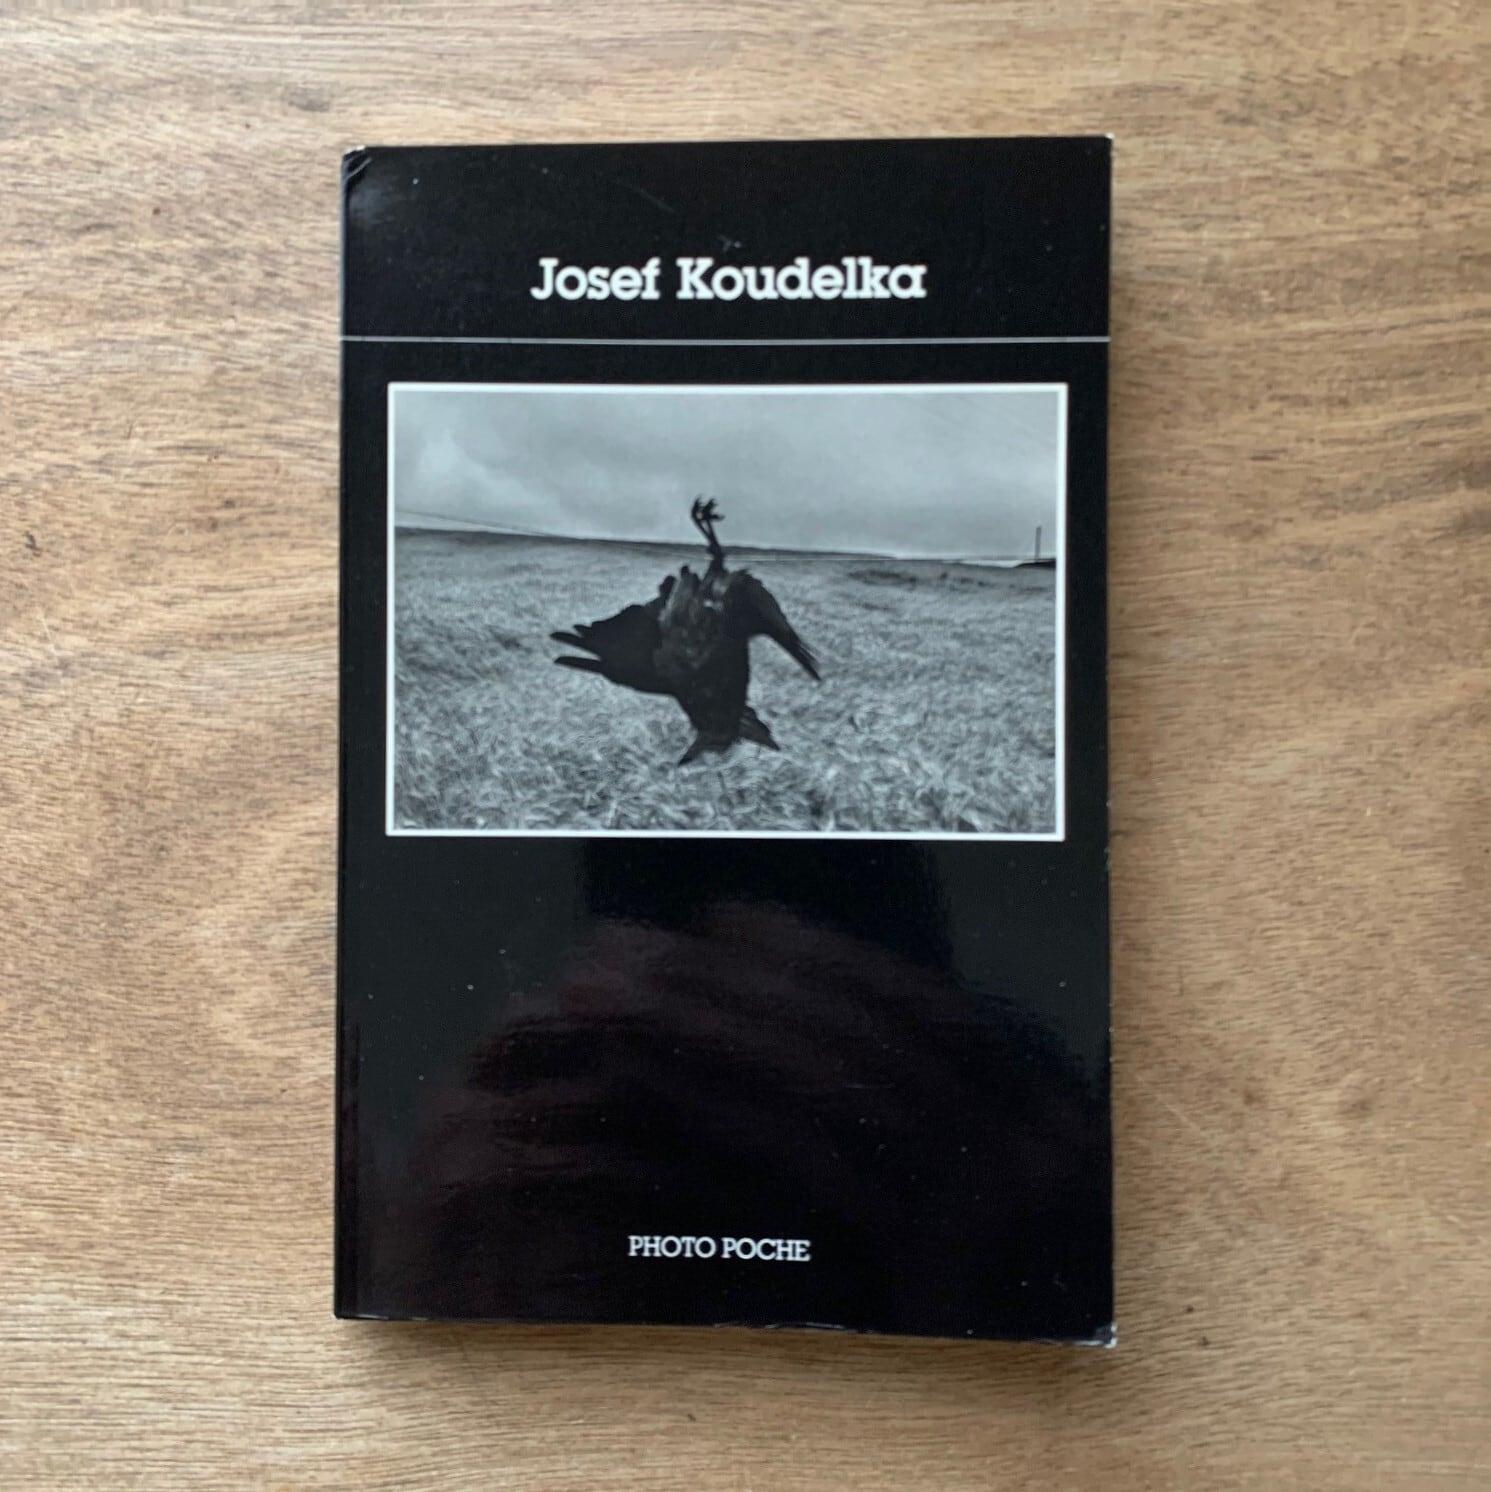 Josef Koudelka  / Photo Poche 15 / ジョセフ・クーデルカ